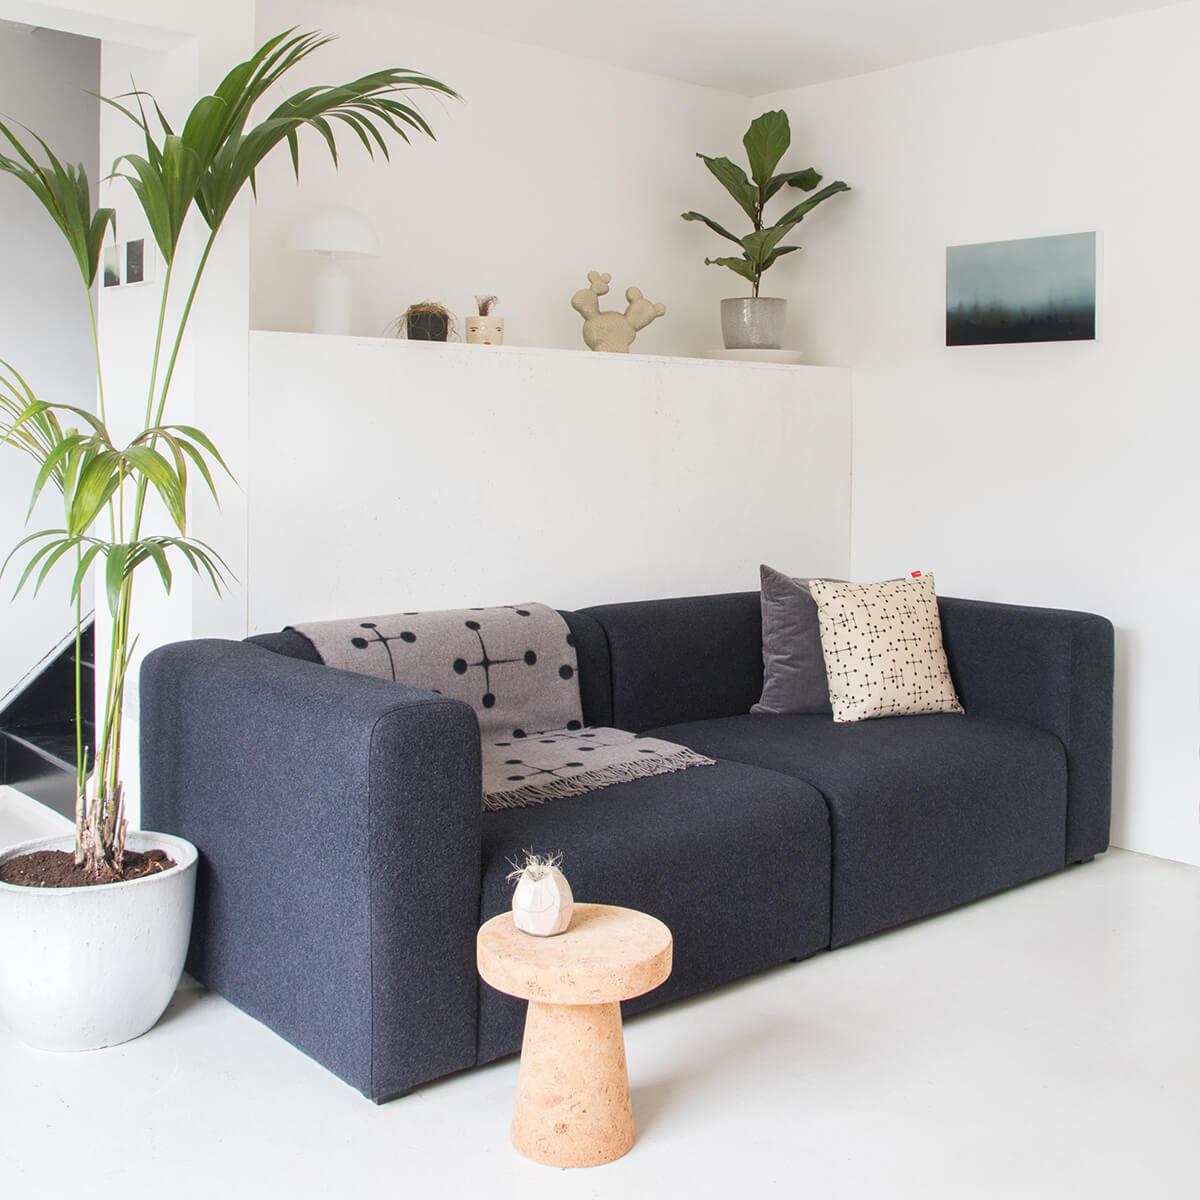 HAY Mags 2.5 Seater Sofa in dark grey fabric